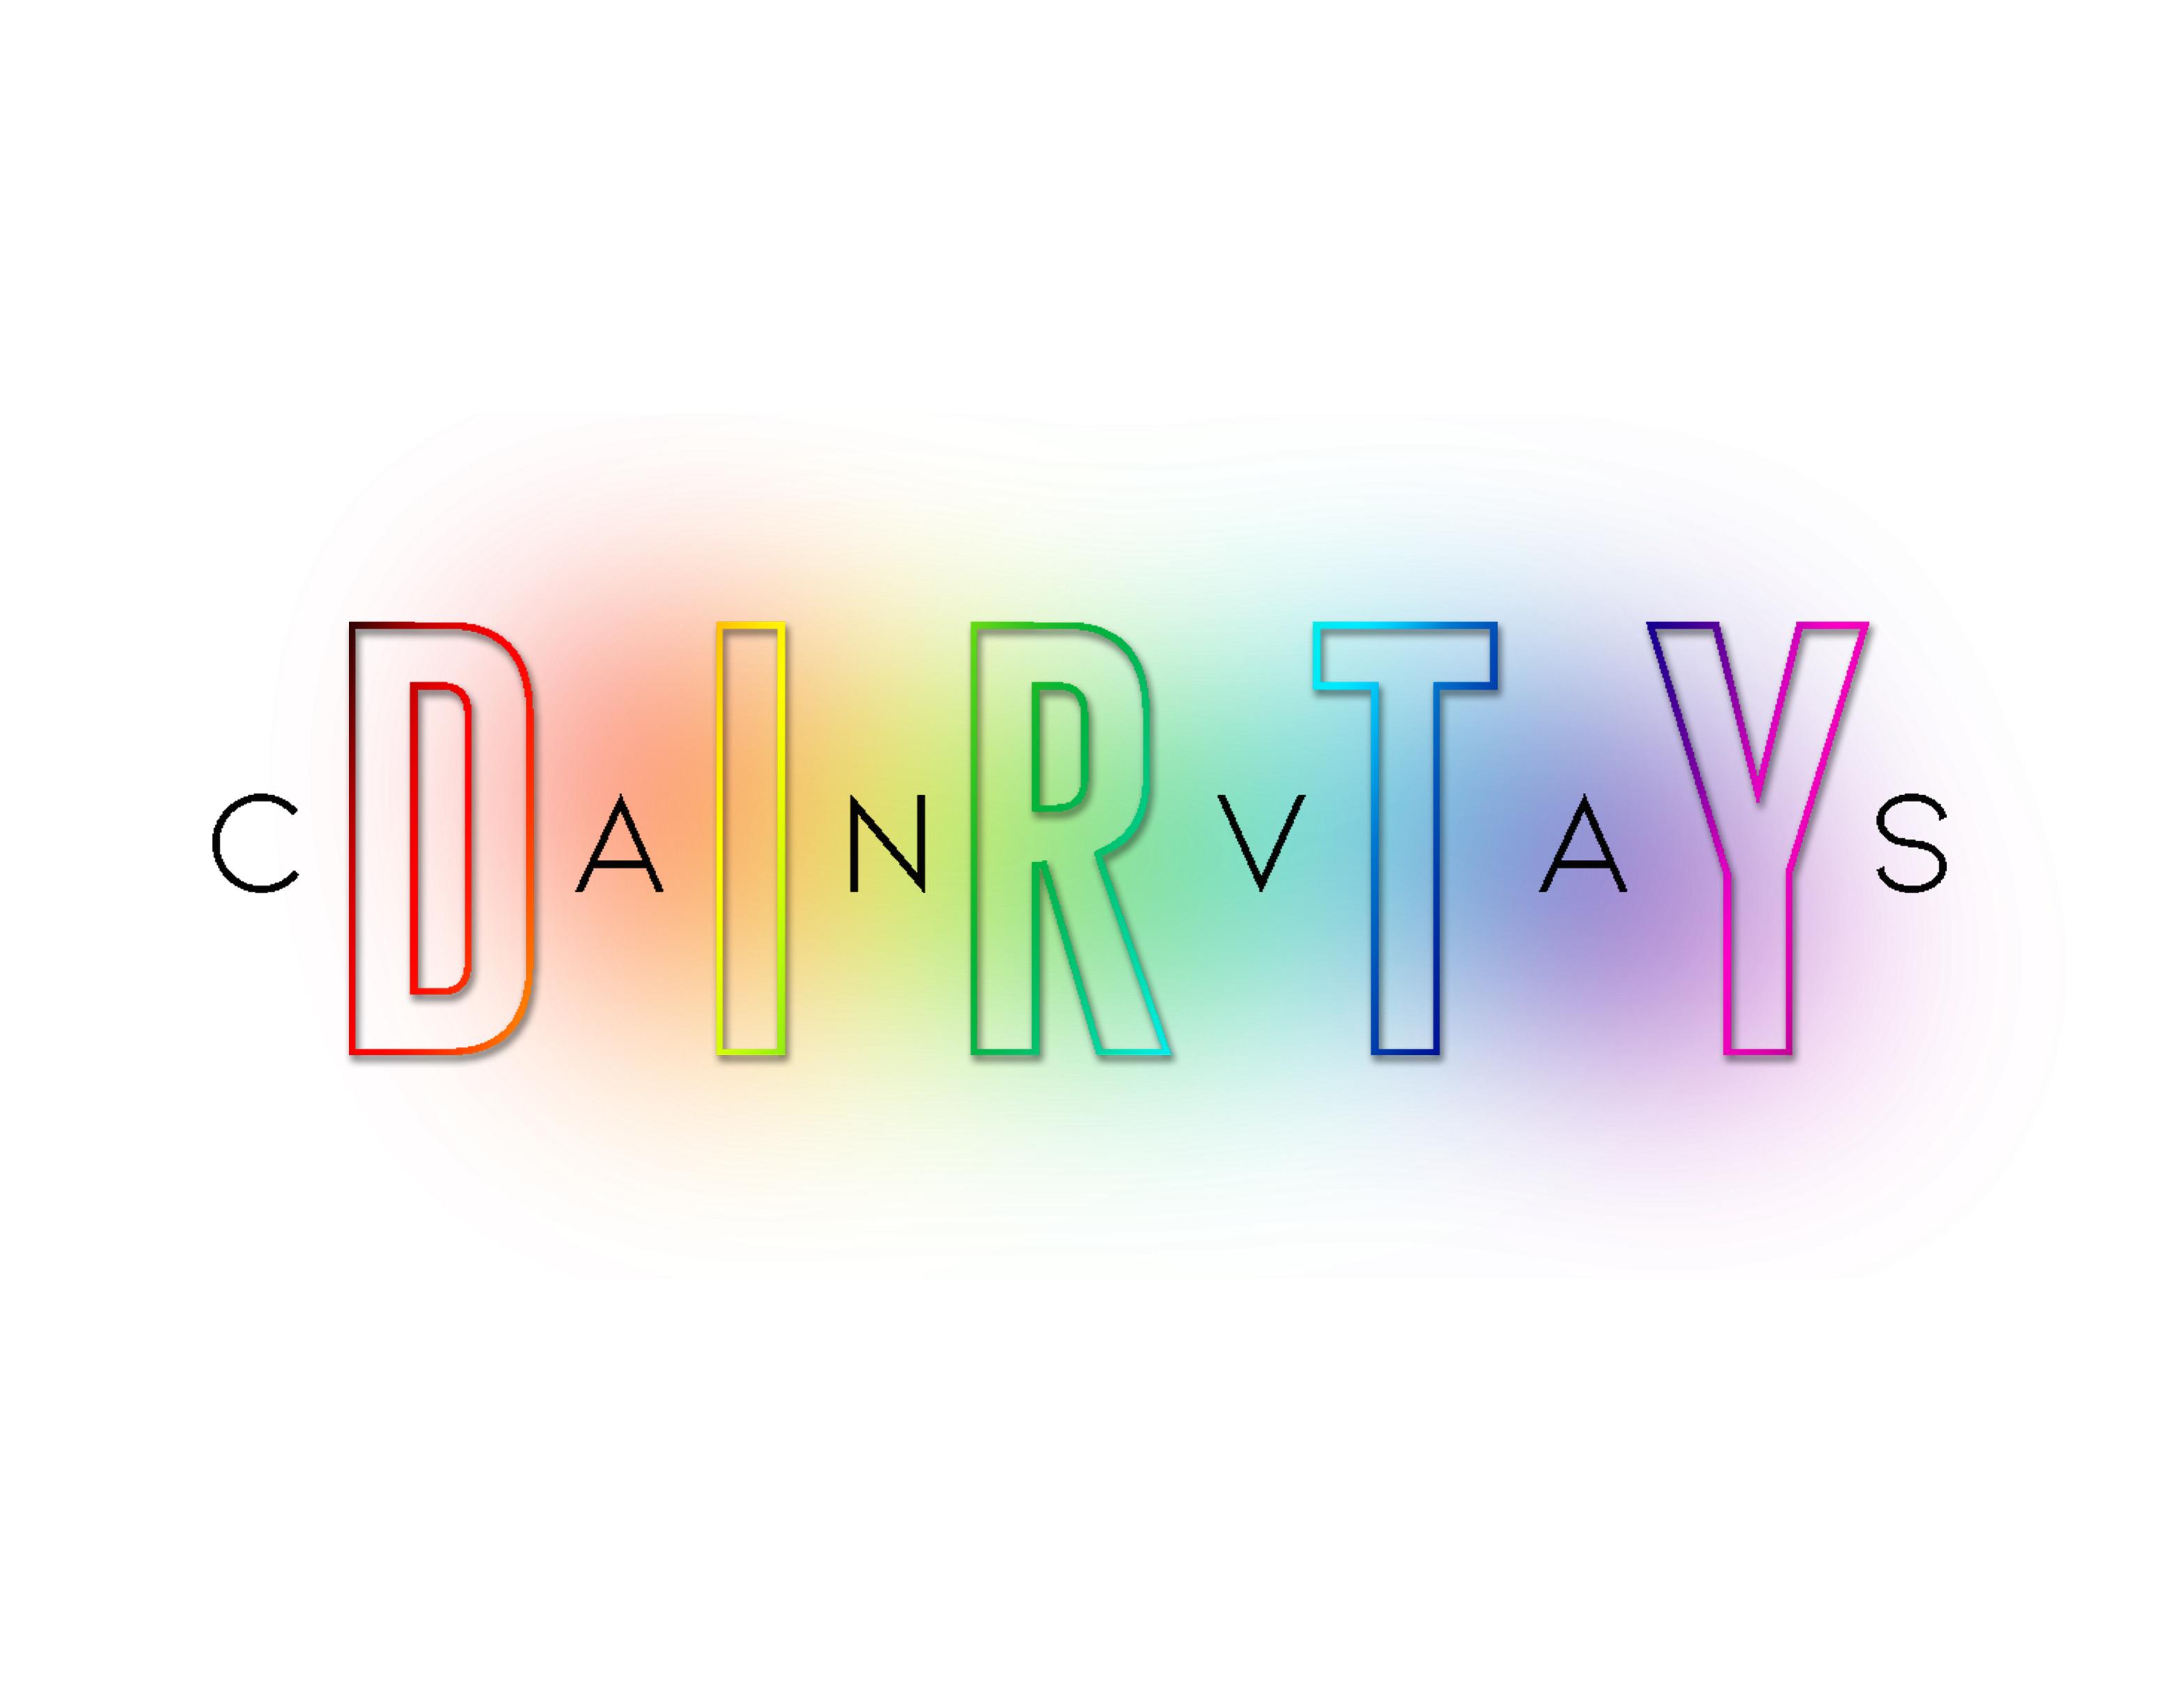 dirty c